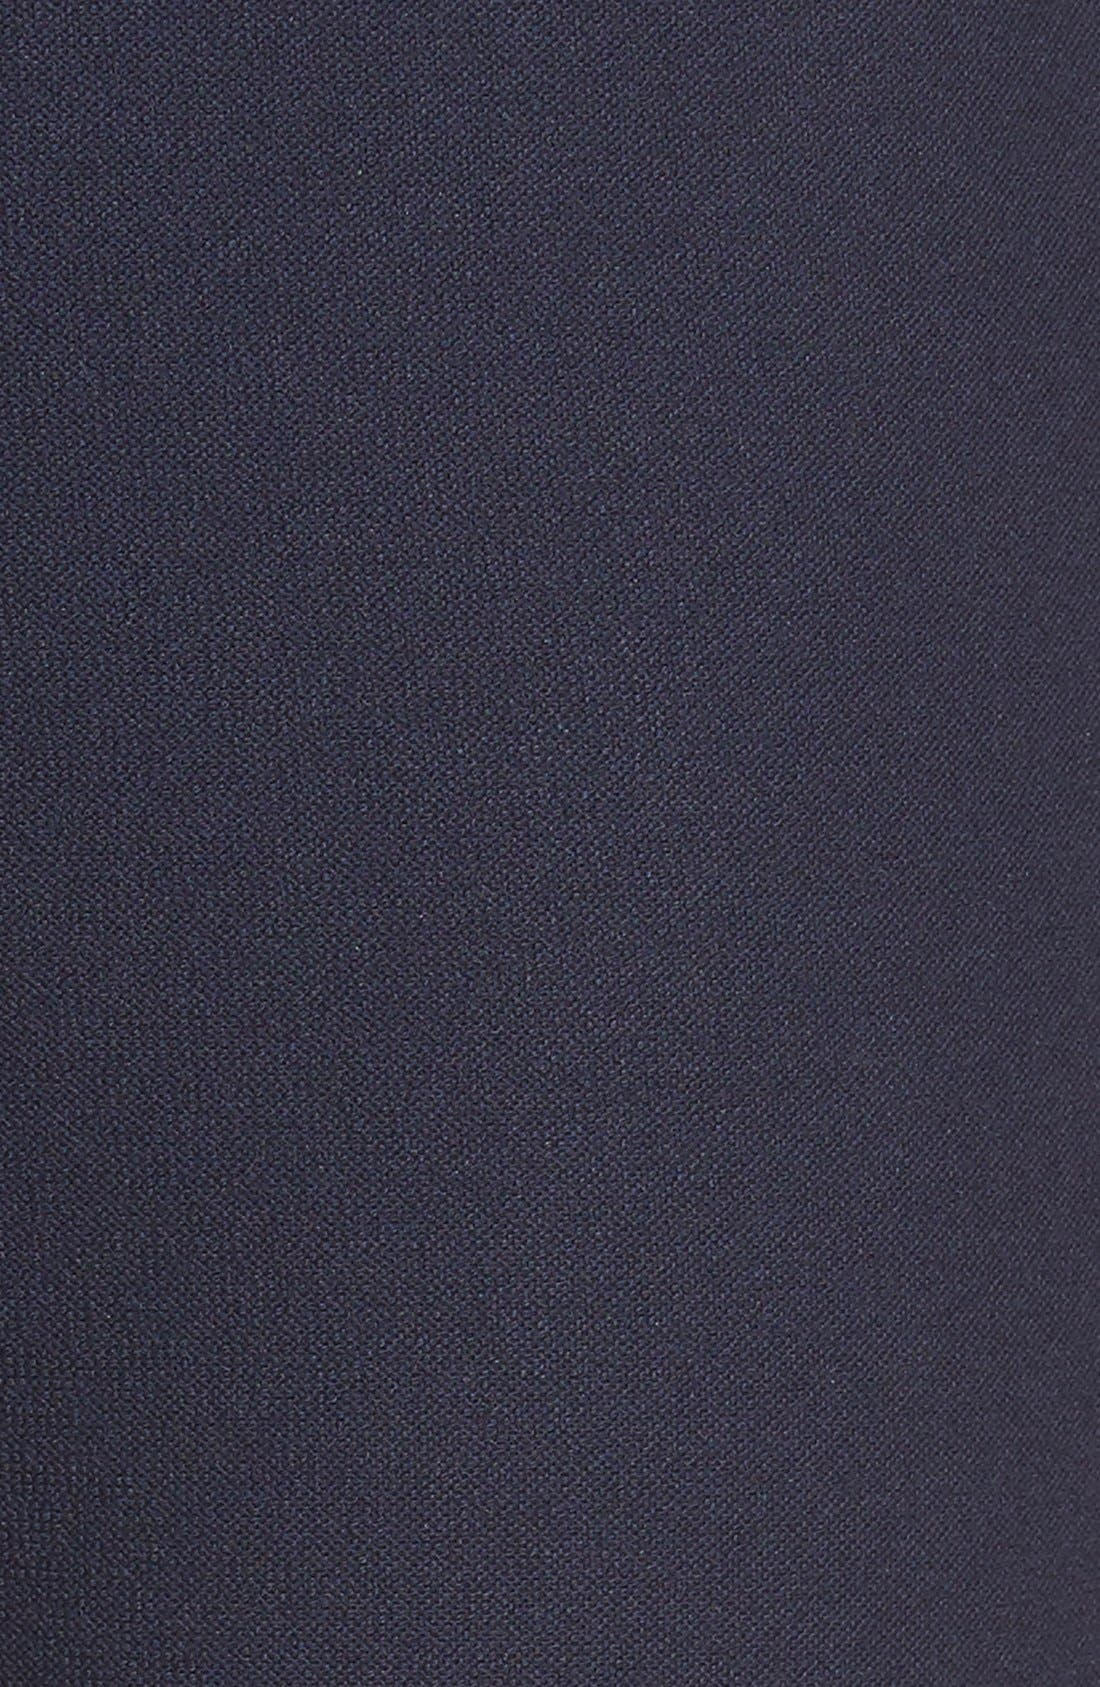 Stretch Crepe Slim Ankle Pants,                             Alternate thumbnail 67, color,